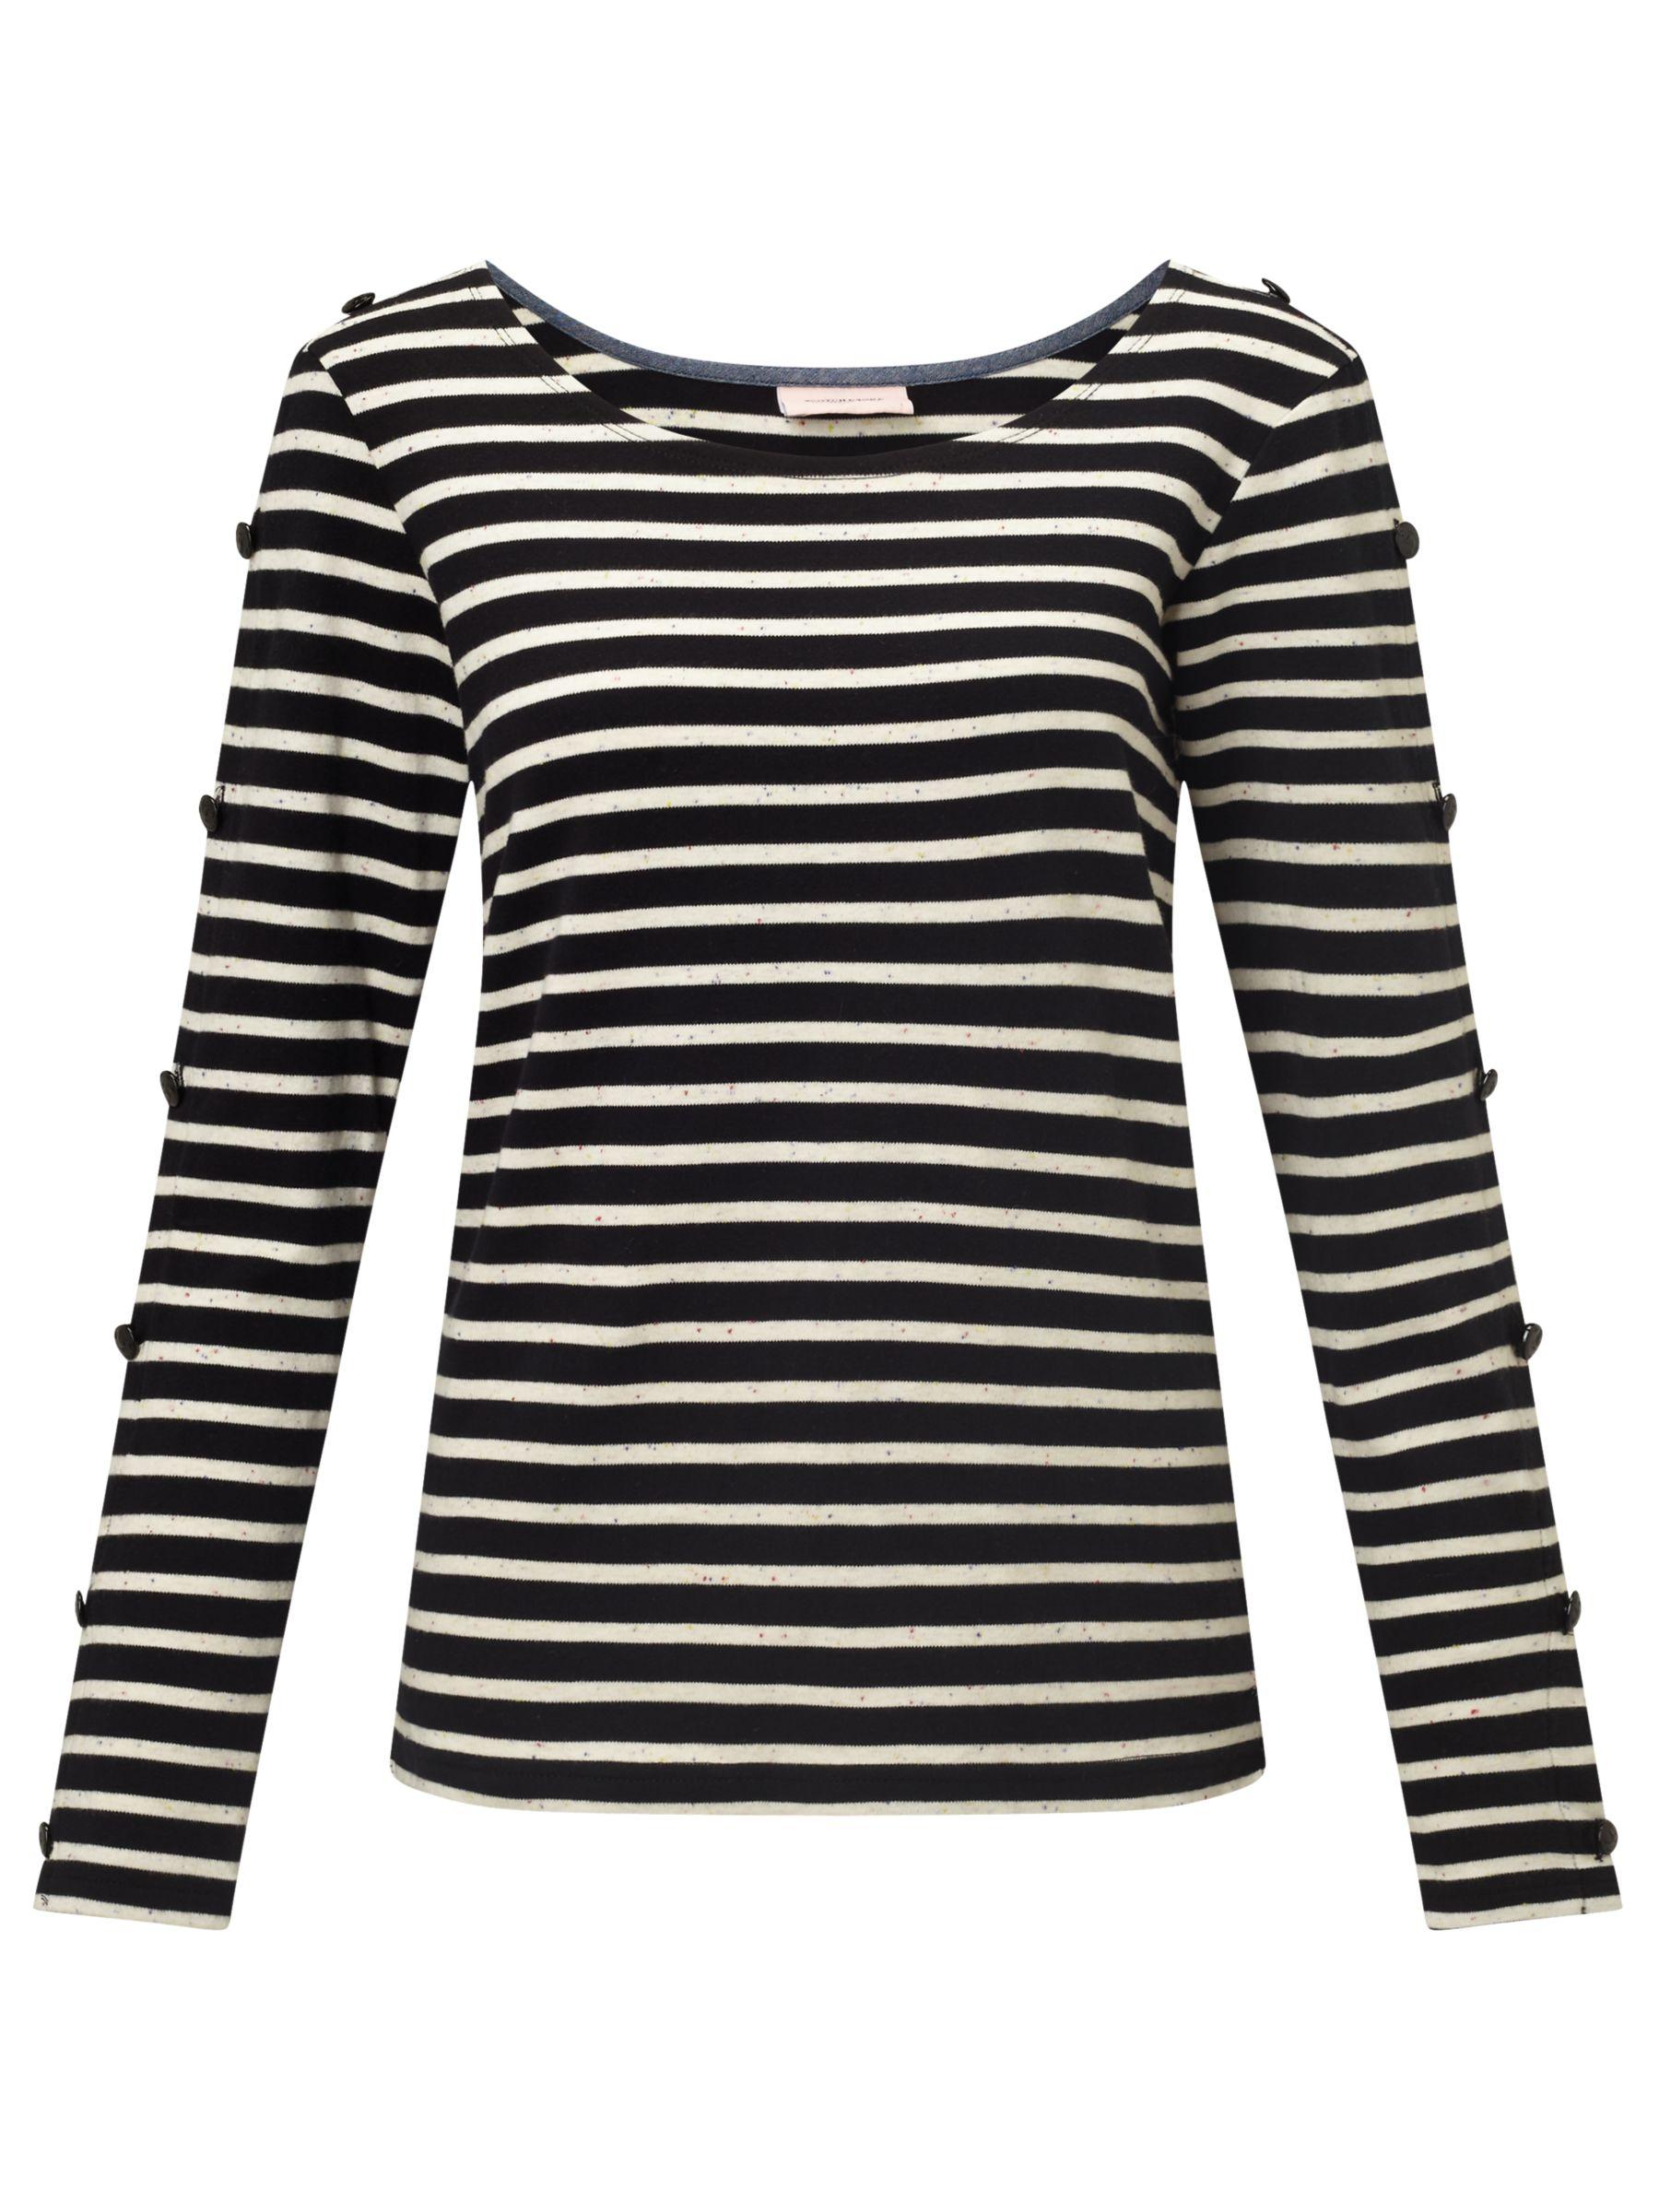 Maison Scotch Maison Scotch Long Sleeve Breton T-Shirt, Black Melange